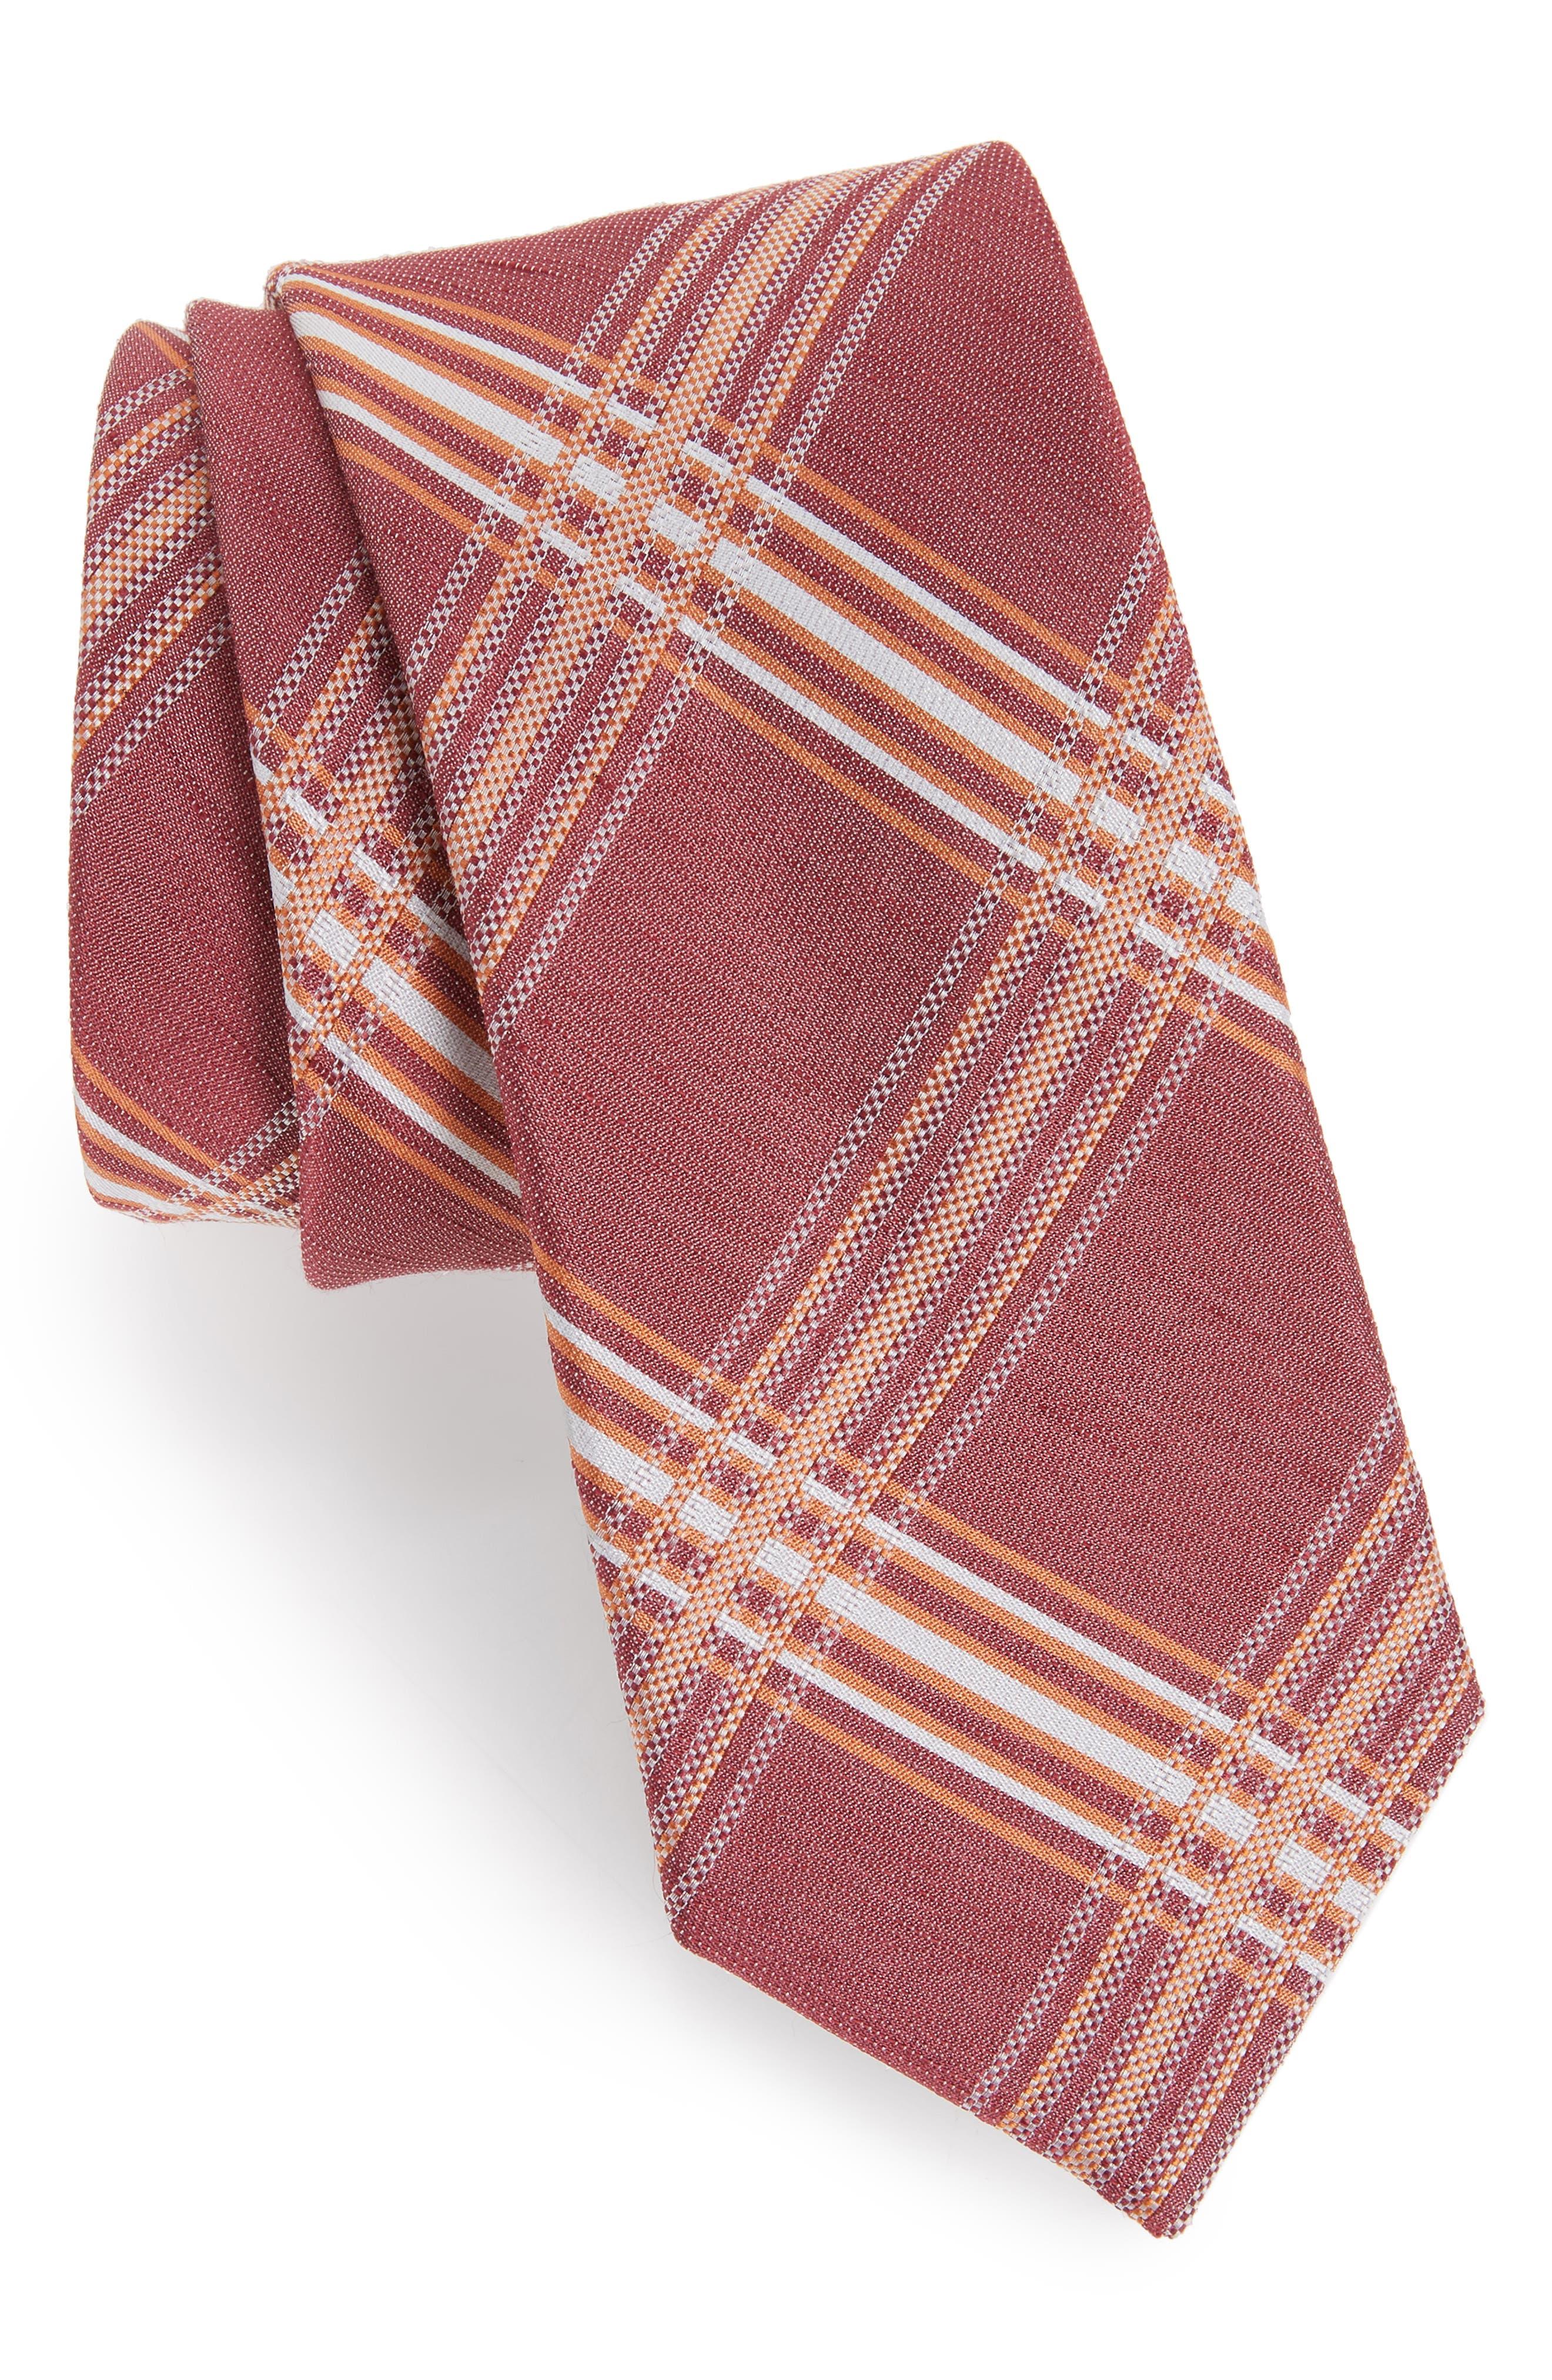 KP Plaid Silk & Linen Tie,                         Main,                         color, MARSALA